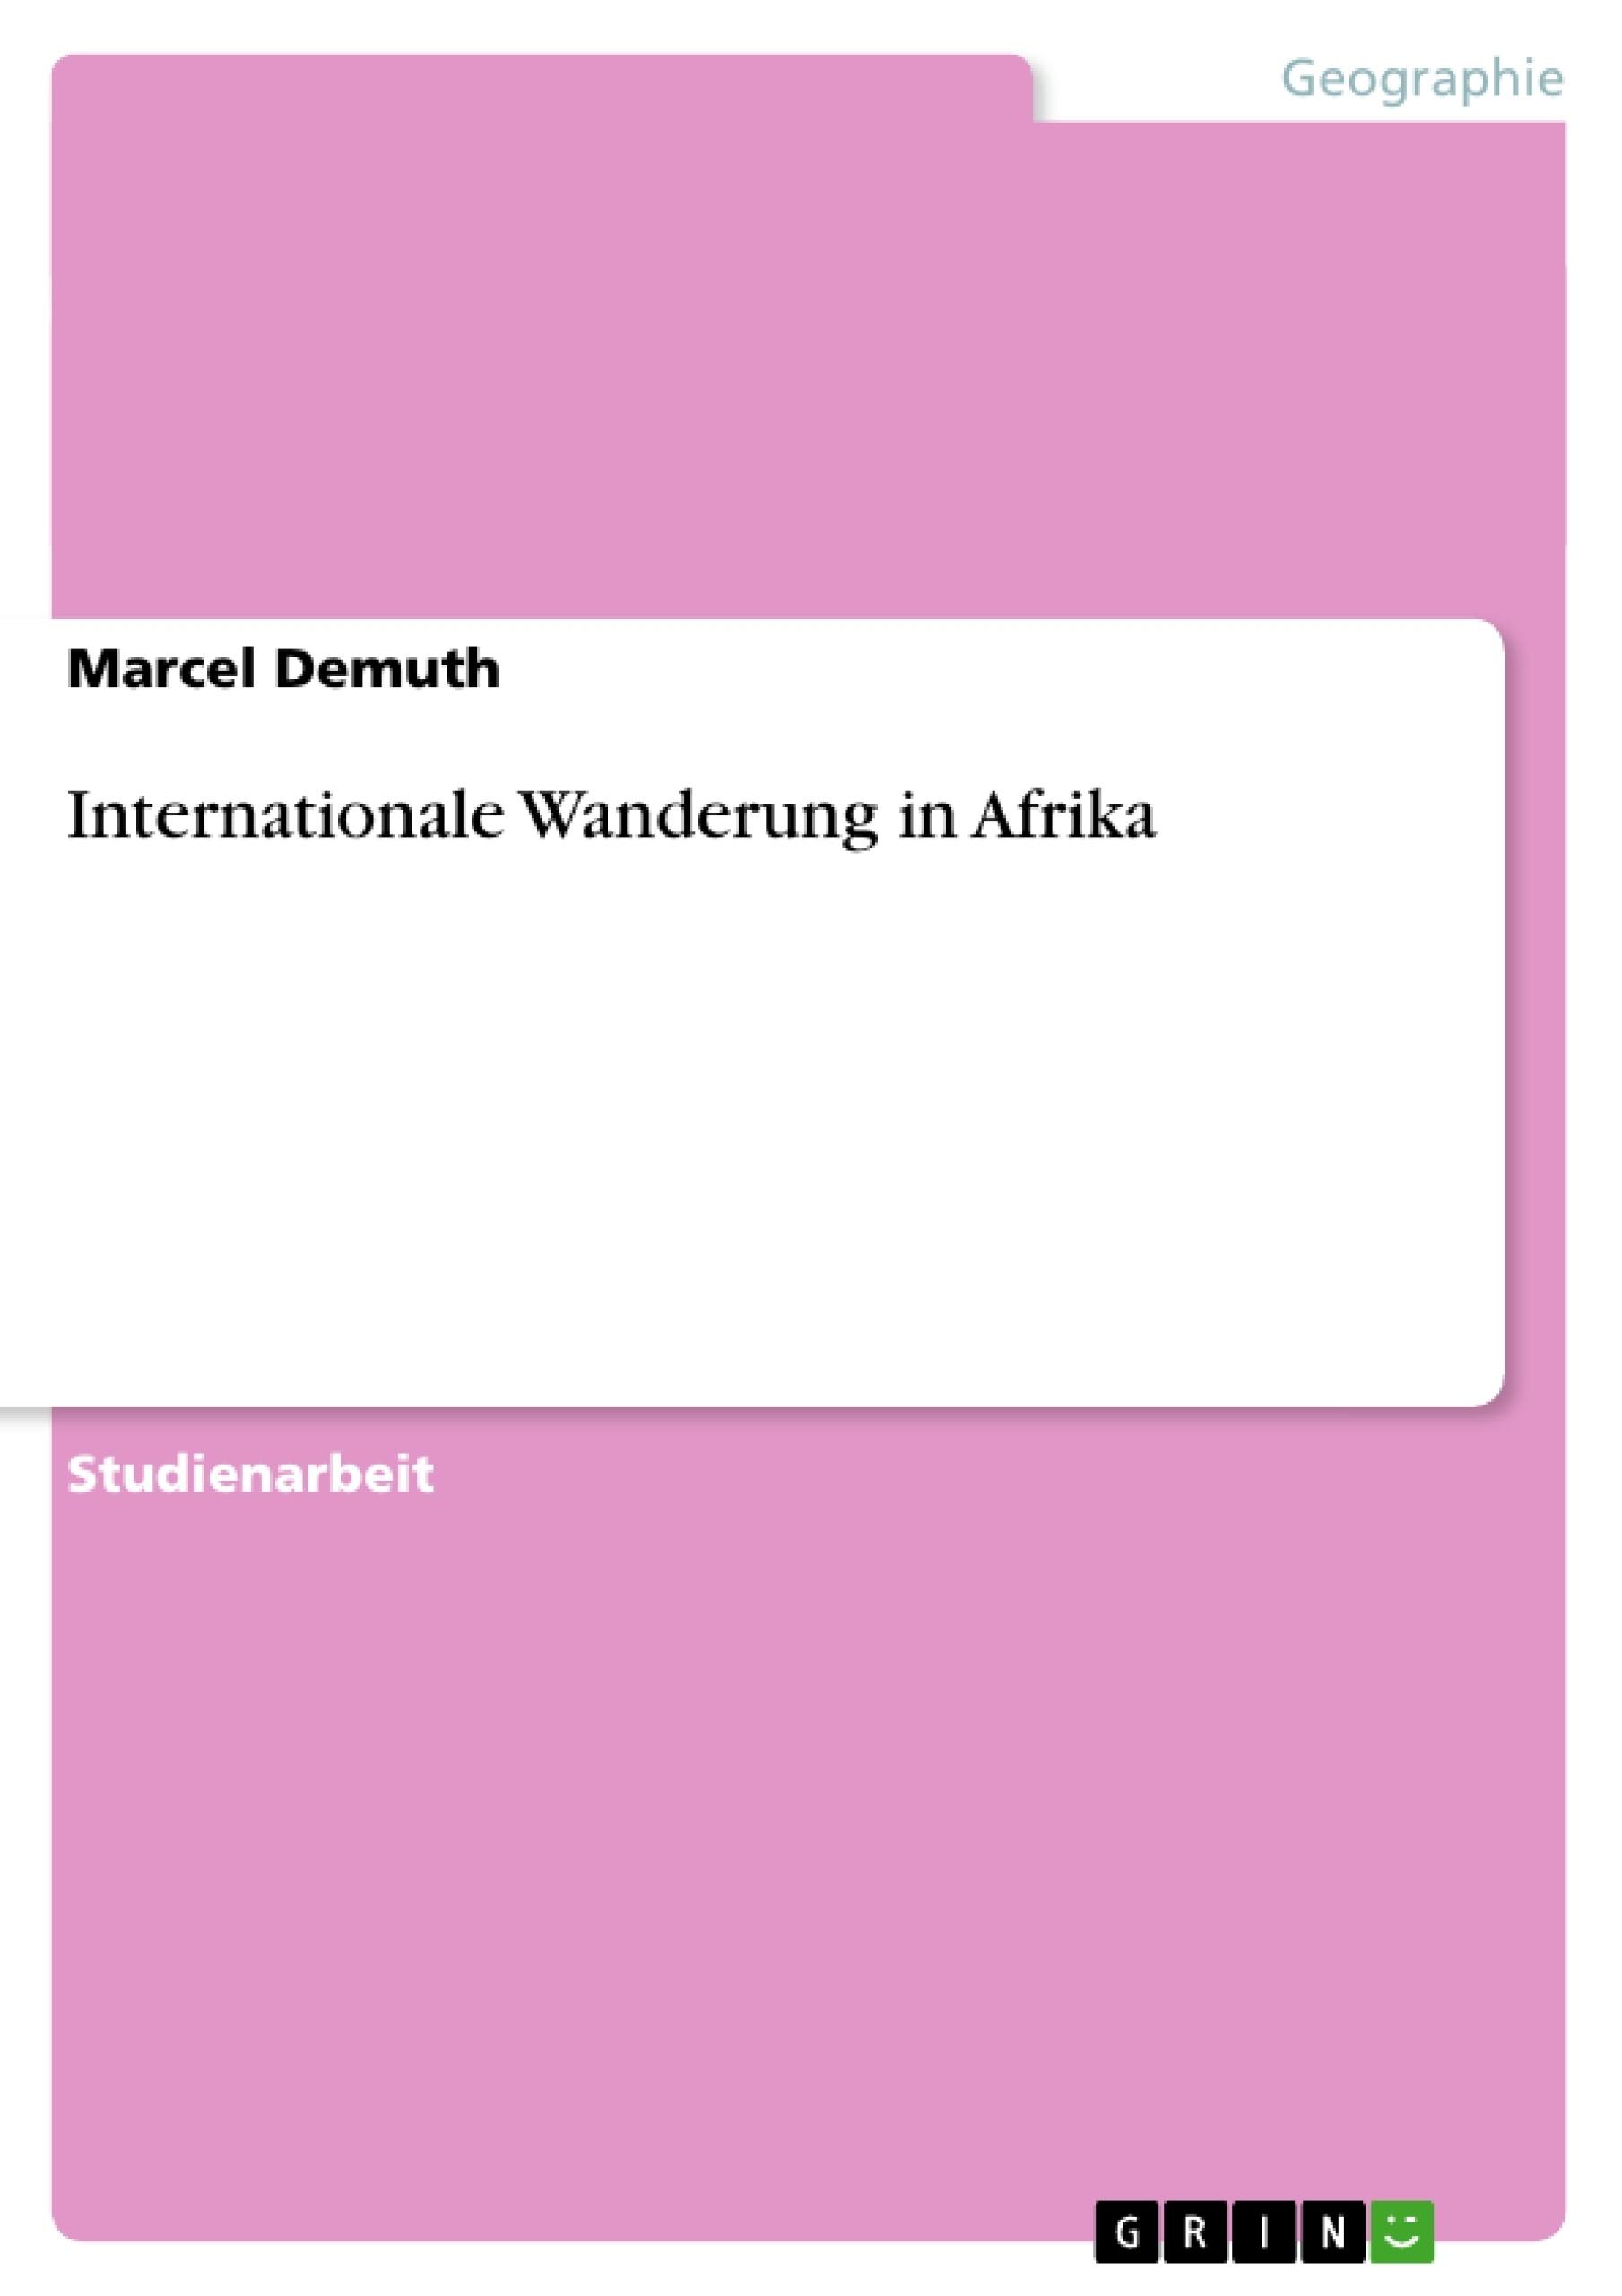 Titel: Internationale Wanderung in Afrika